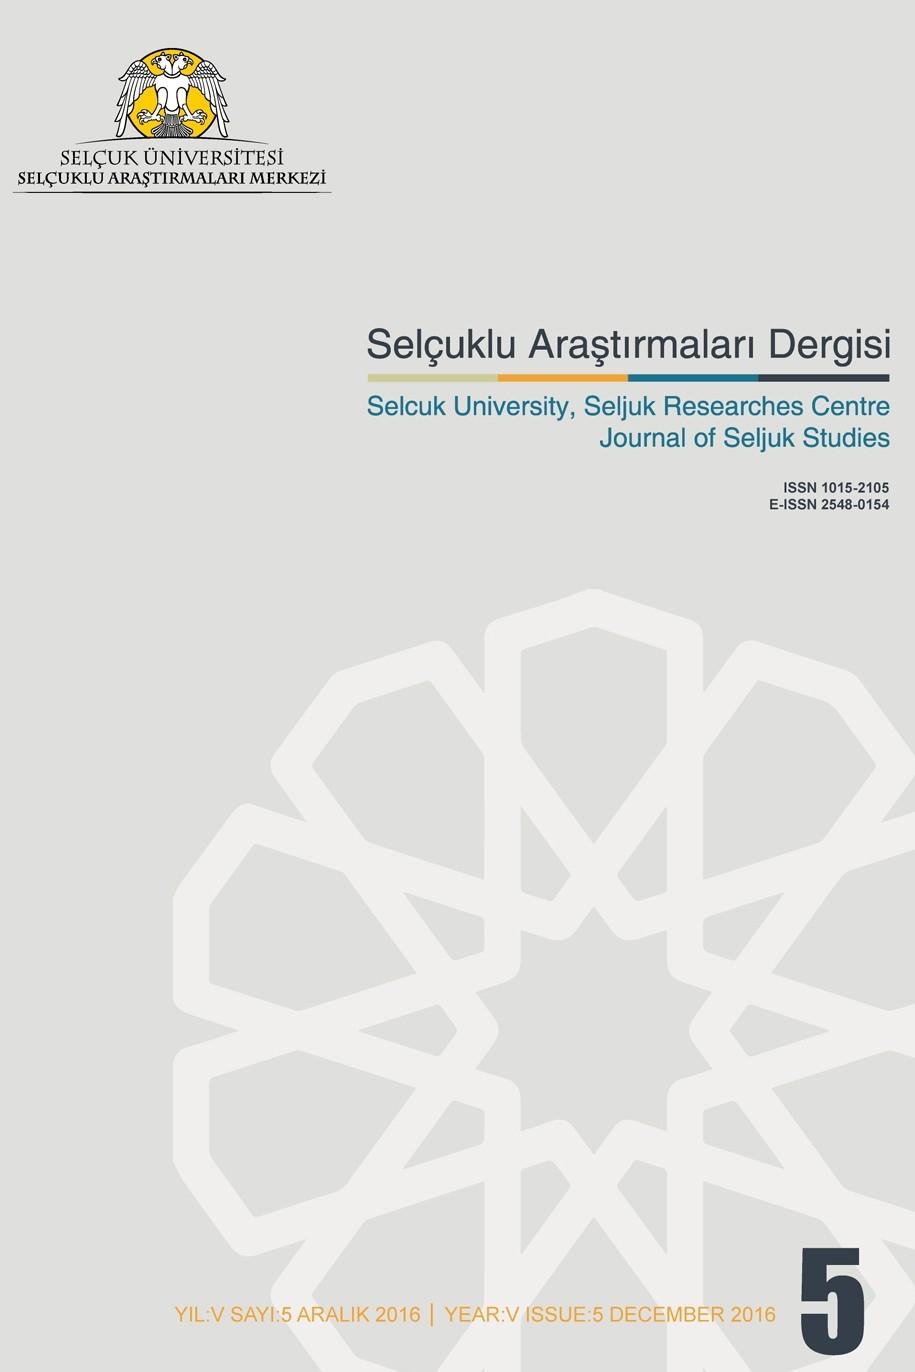 Selcuk University Journal of Seljuk Studies